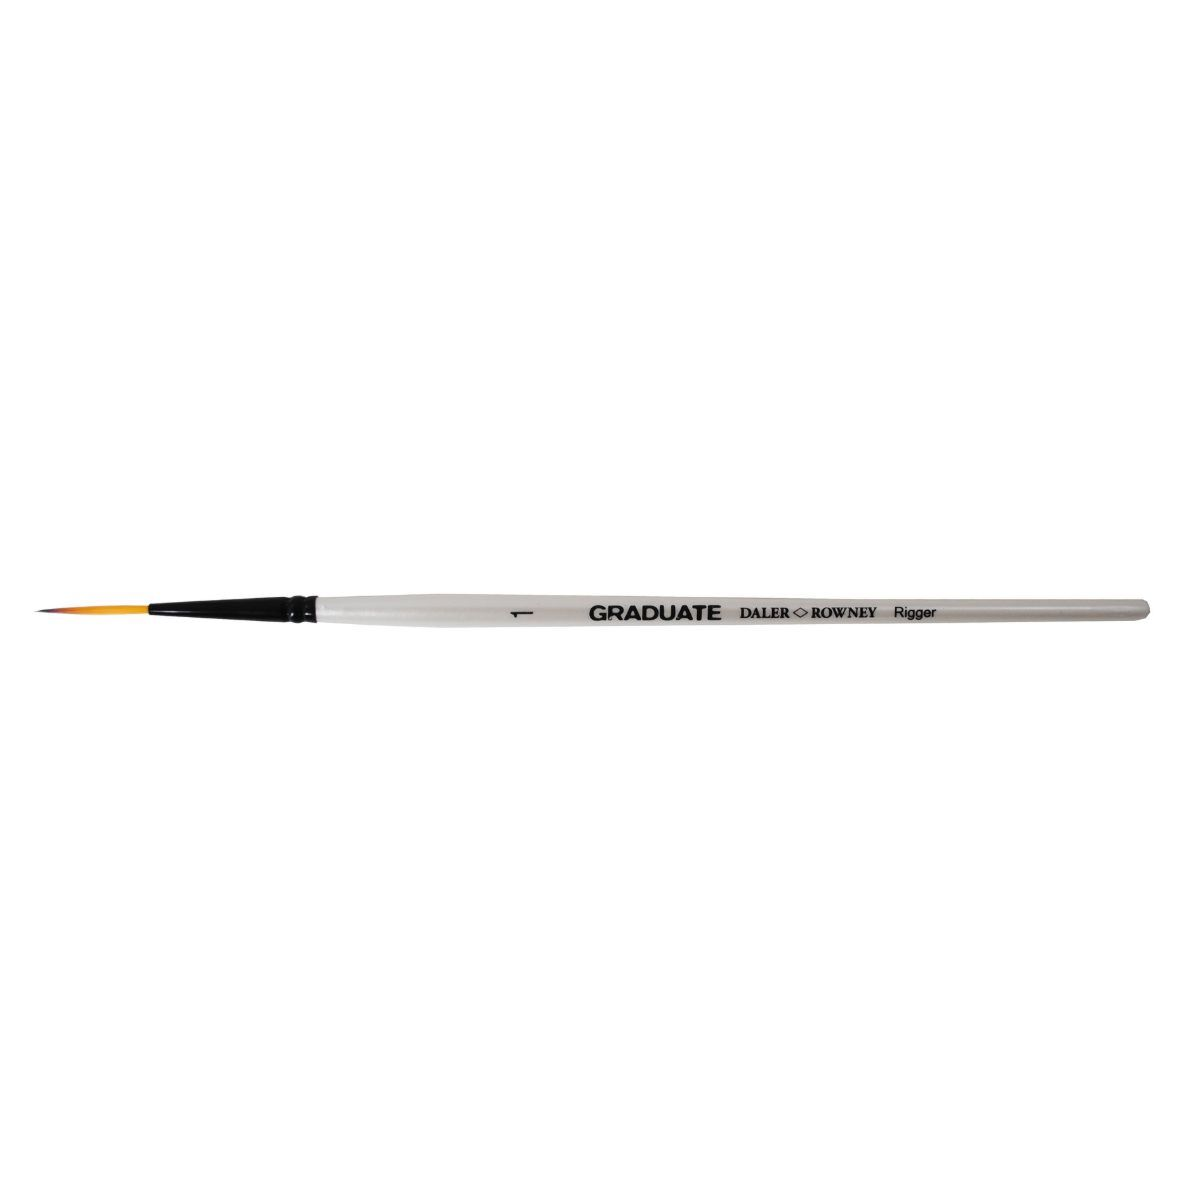 Daler Rowney Graduate Brush Dark Tip Synthetic Rigger 1